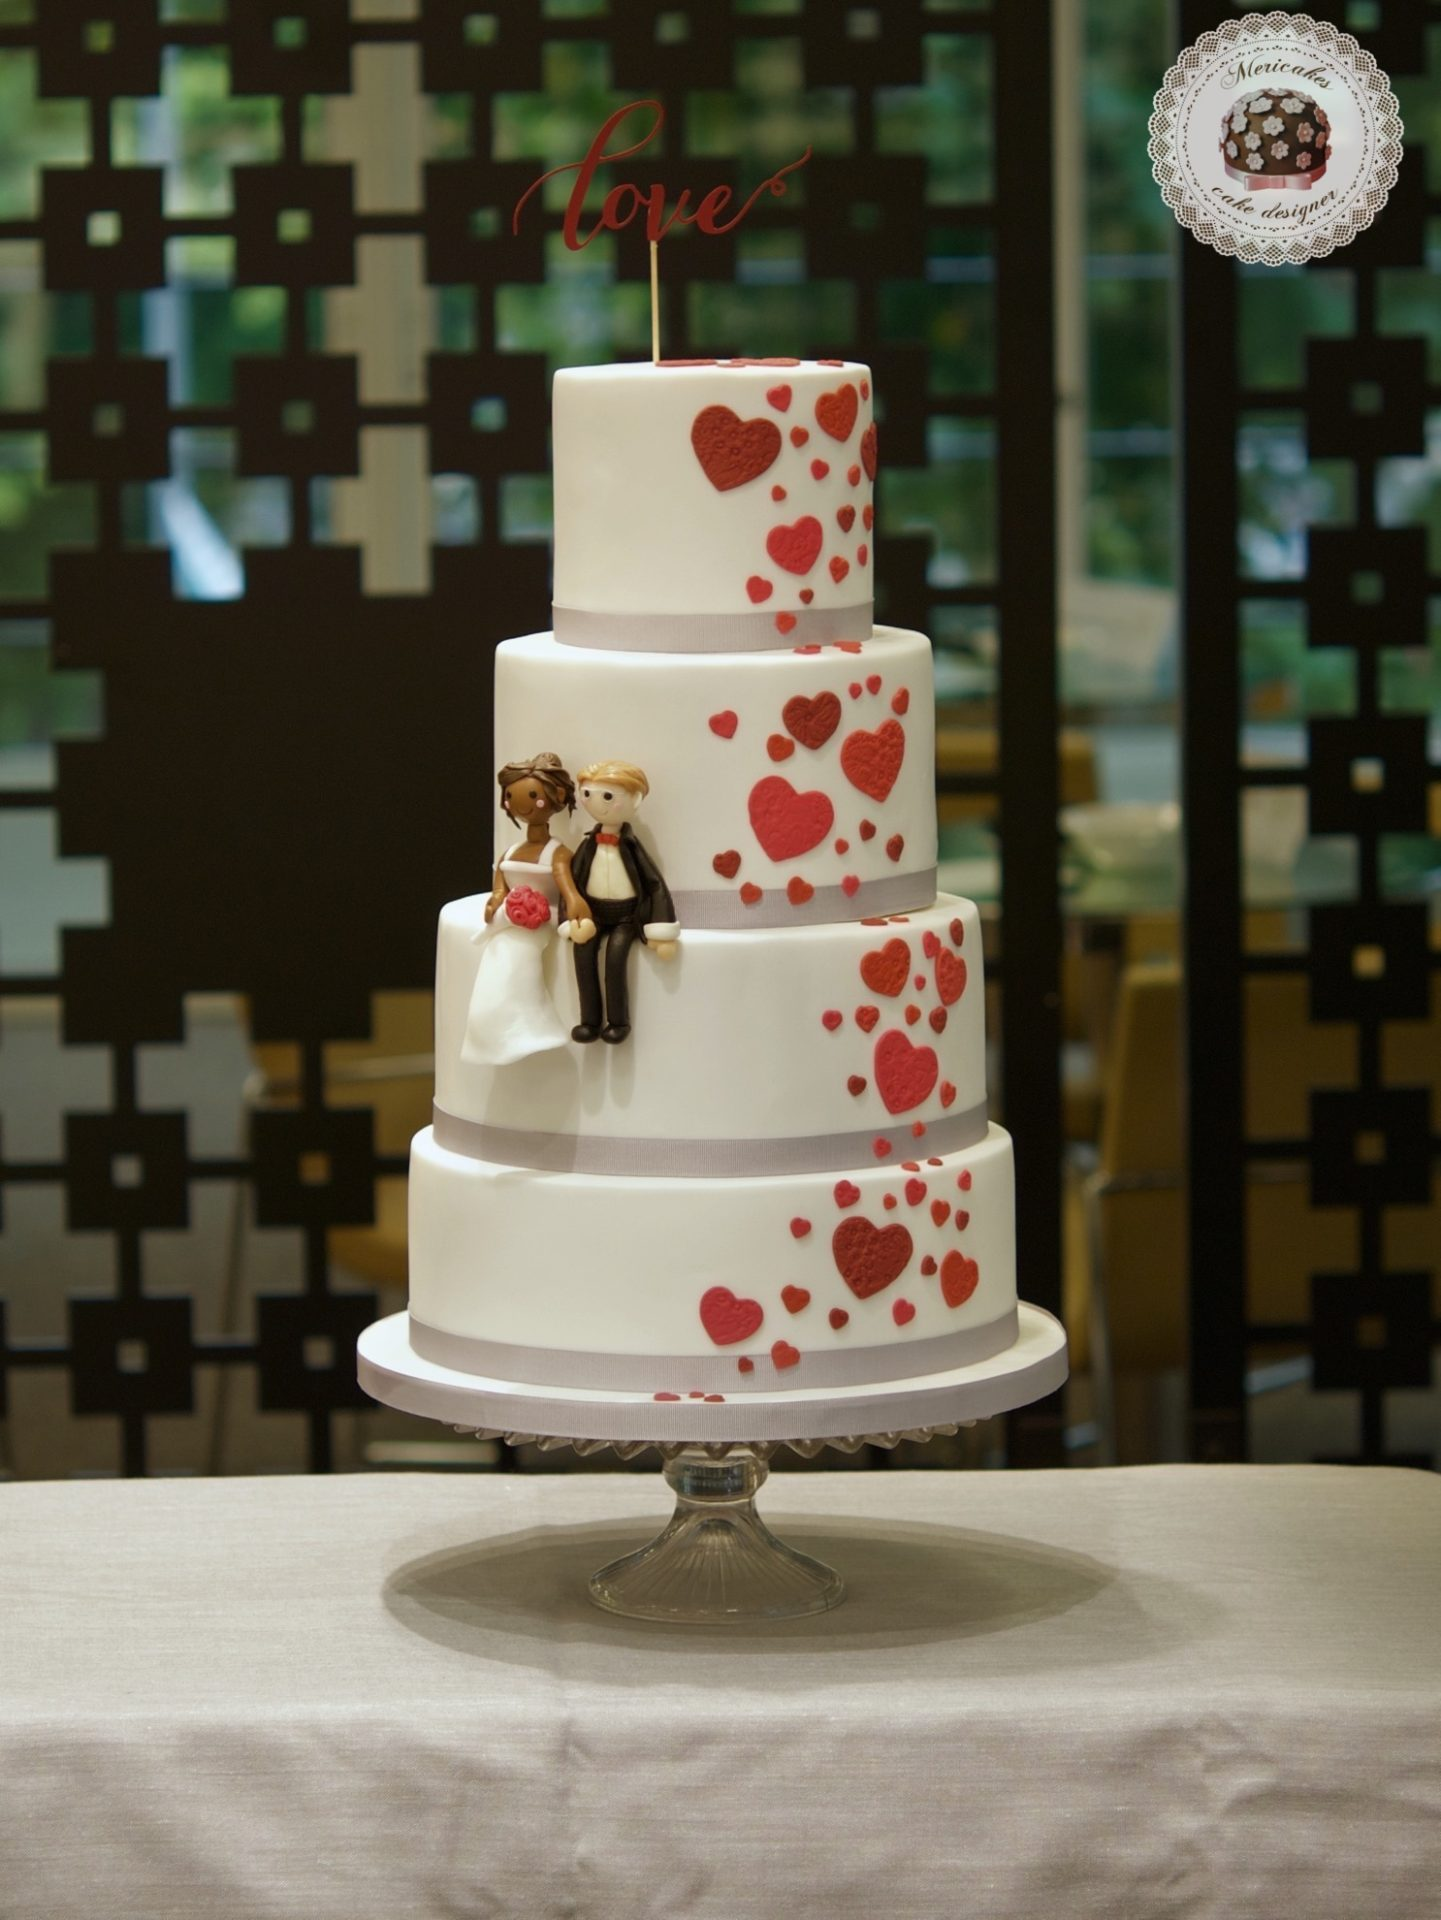 Tarta de boda, wedding cake, hearts cake, fondant, barcelona, mericakes, cava, rosas, almendra, champagne cream, groom, bride, cake topper, sugarcraft, chocolate, melia sarria